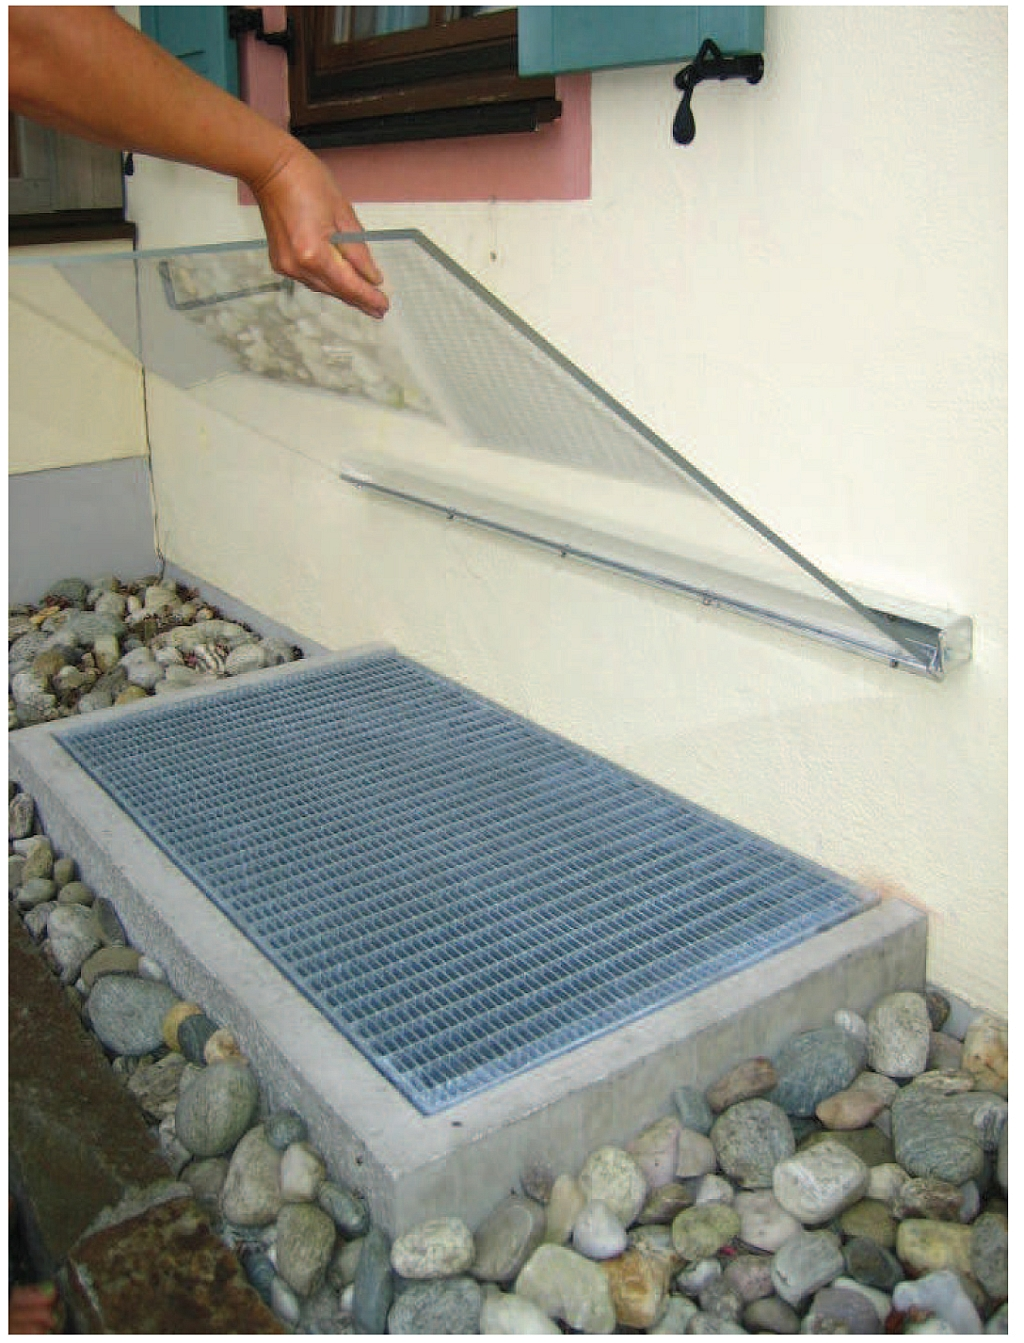 acryl regenabdeckung schr g klappbar hieber beton. Black Bedroom Furniture Sets. Home Design Ideas